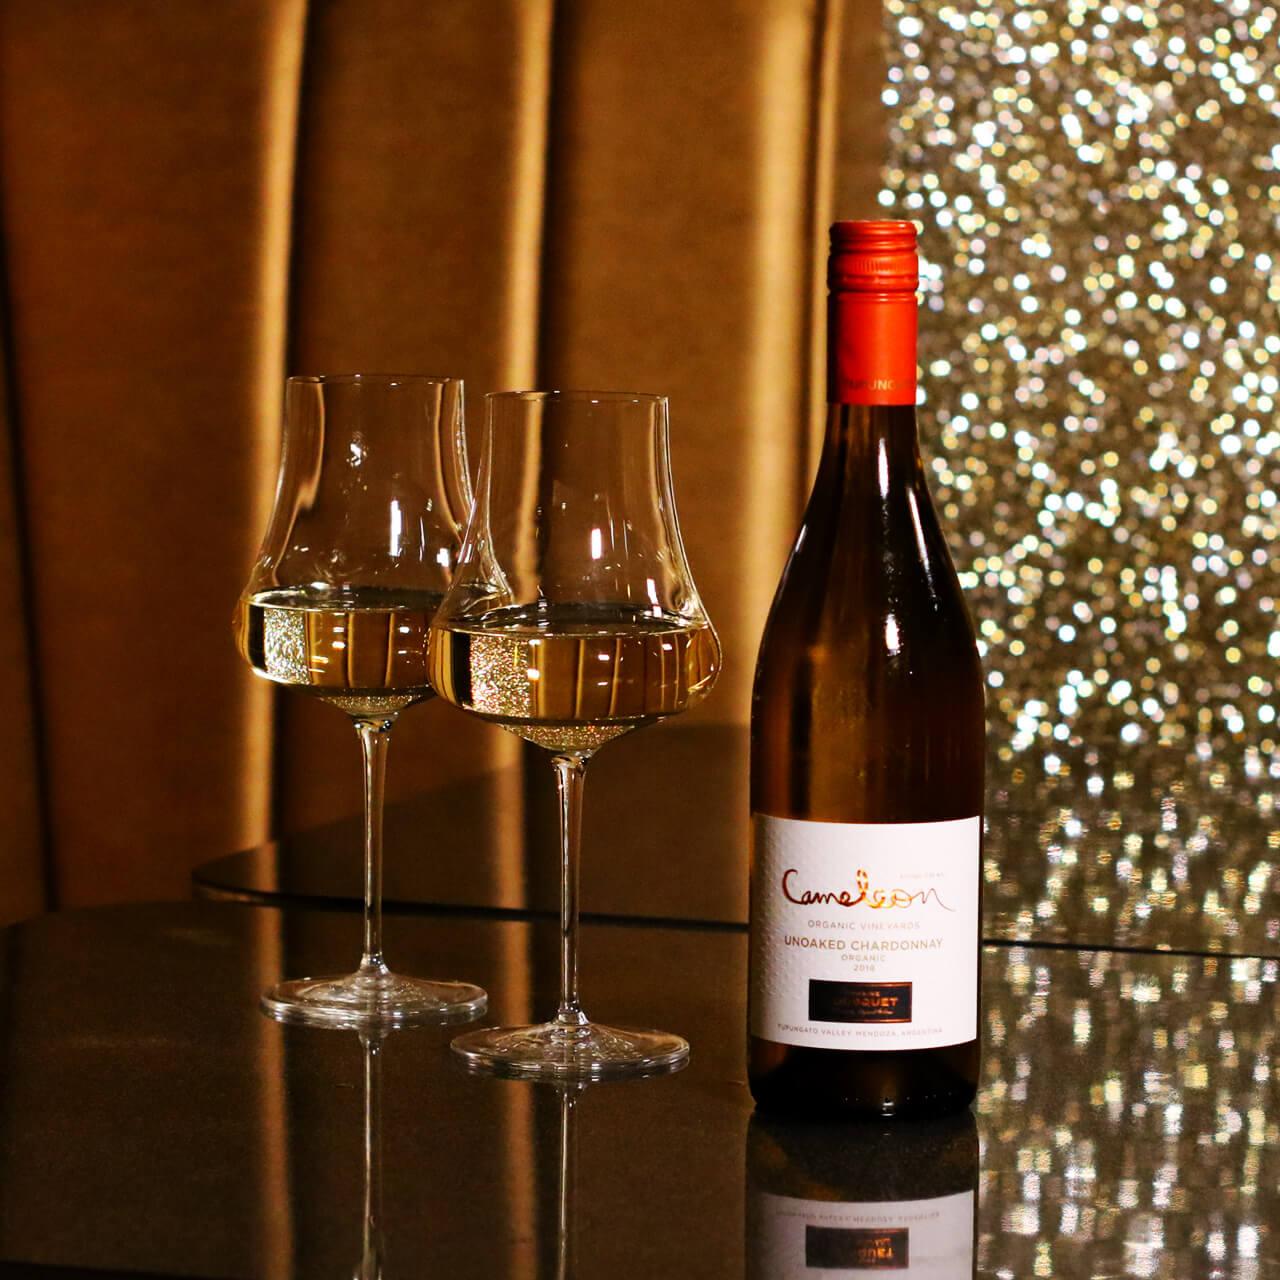 Domaine Bousquet Cameleon Unoaked Chardonnay - Frankies Wine Bar